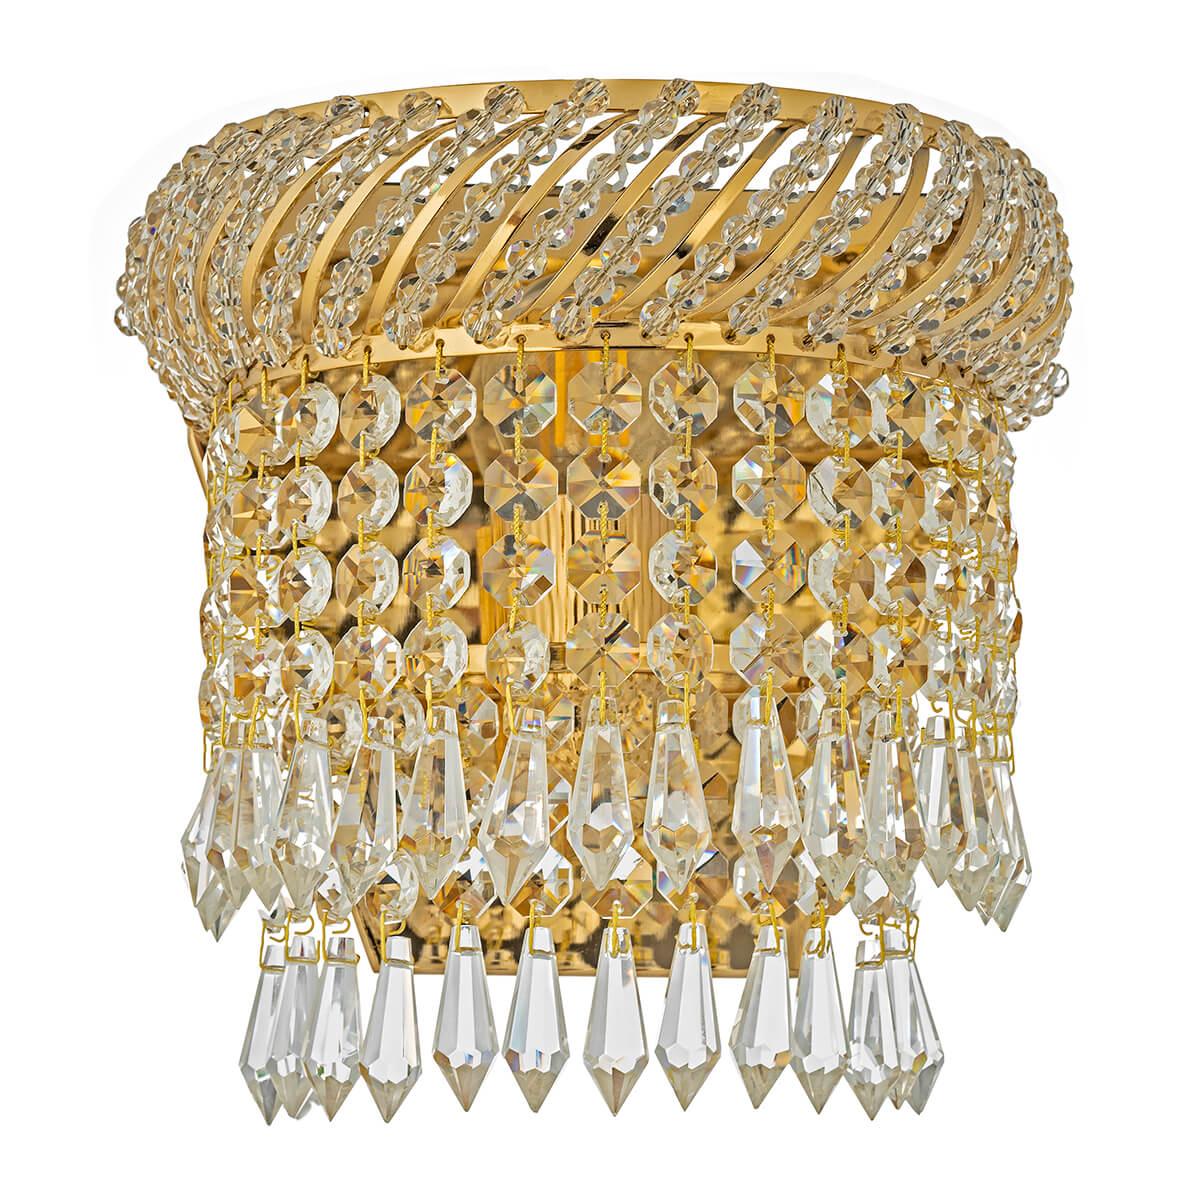 Светильник Dio D`arte Bari E 2.10.100 G Bari Gold фото